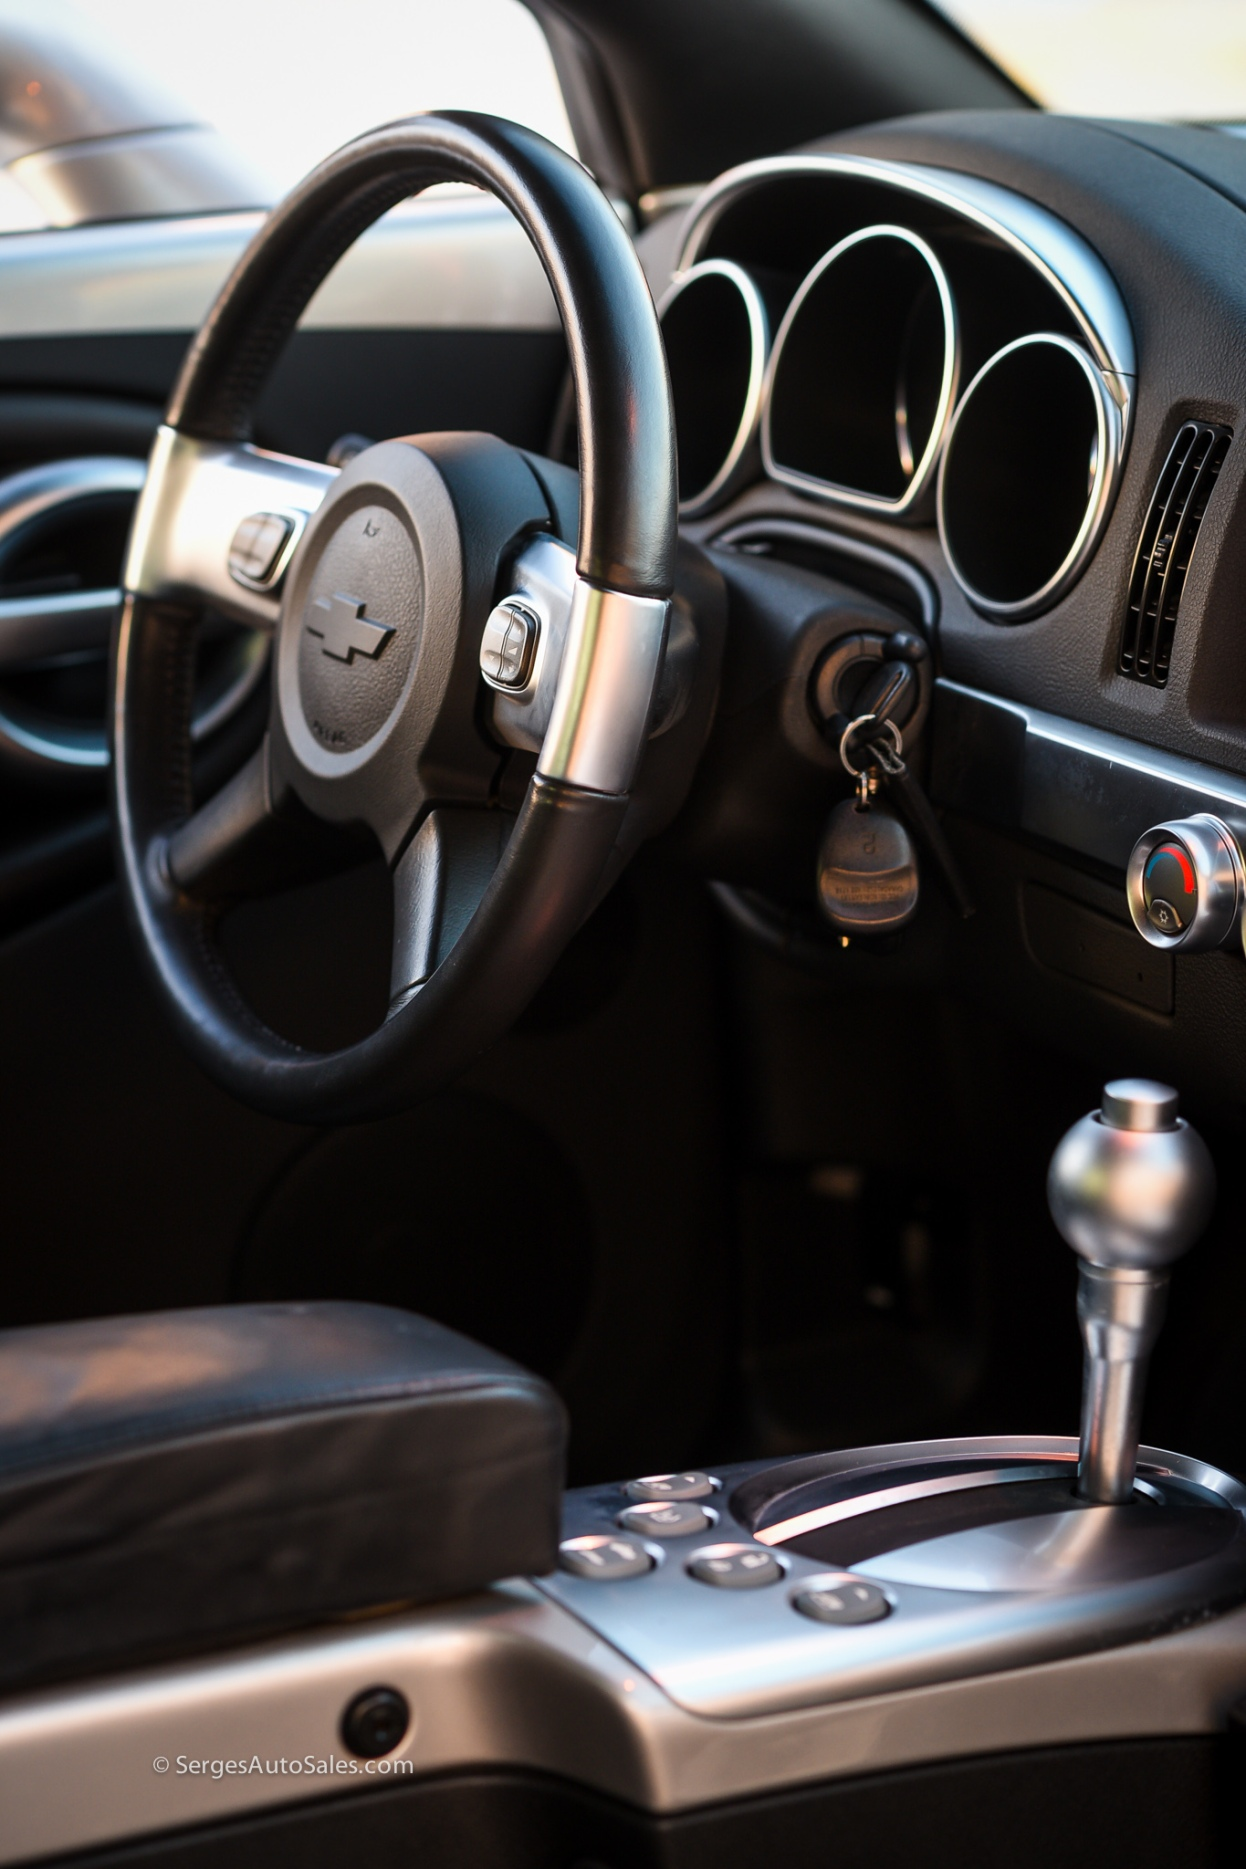 SSR-For-sale-serges-auto-sales-northeast-pa-car-dealer-specialty-corvettes-muscle-classics-38